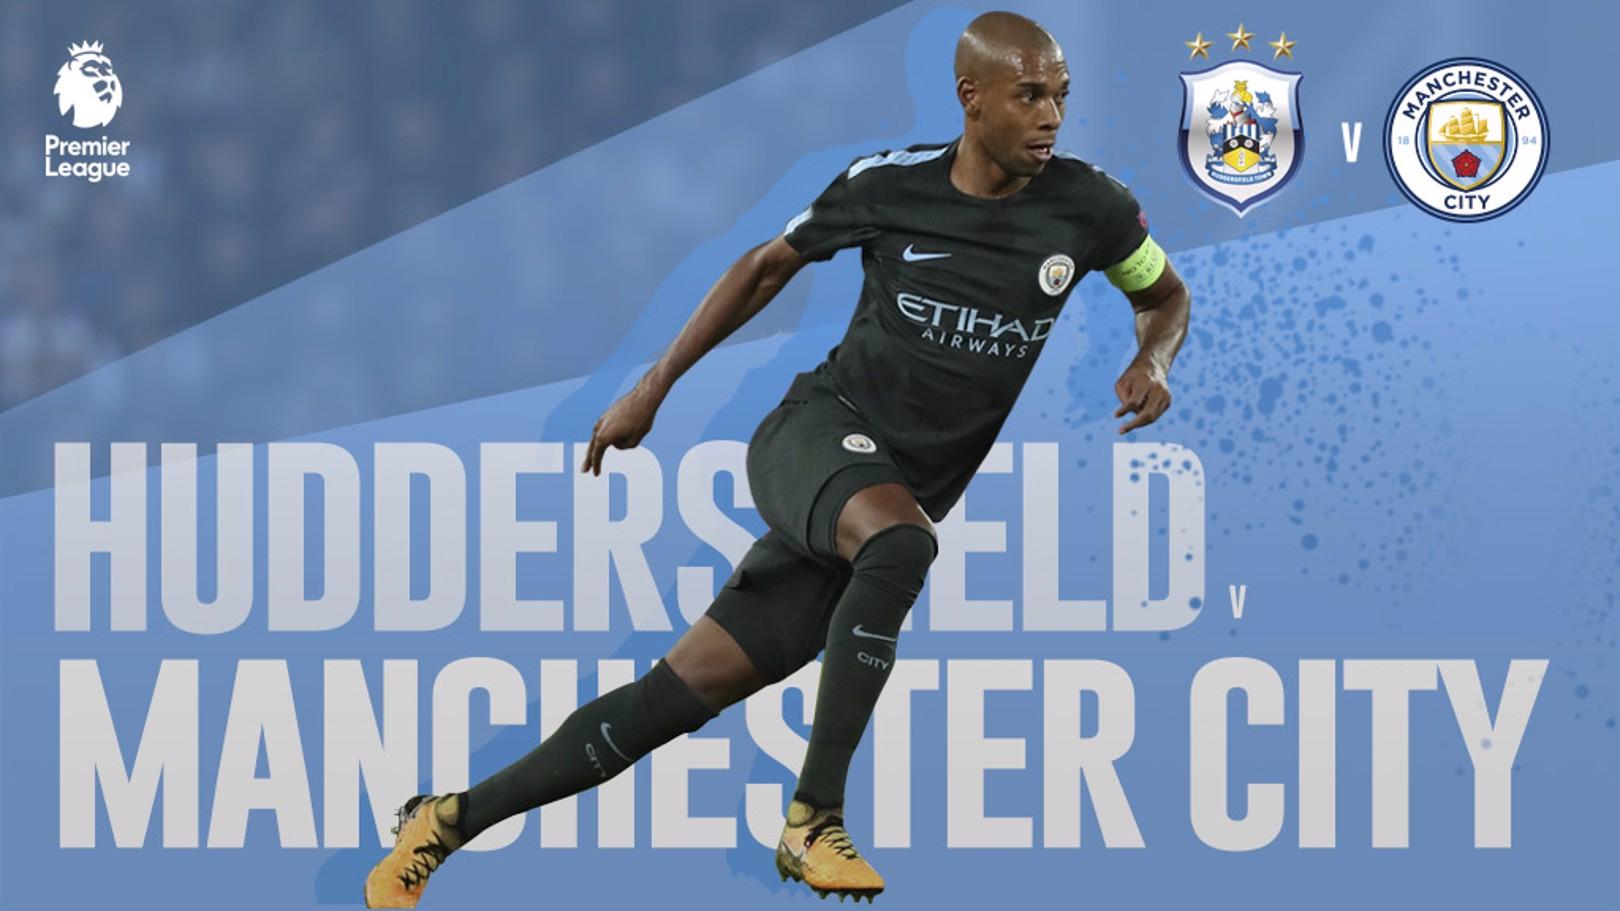 Huddersfield x Fernandinho